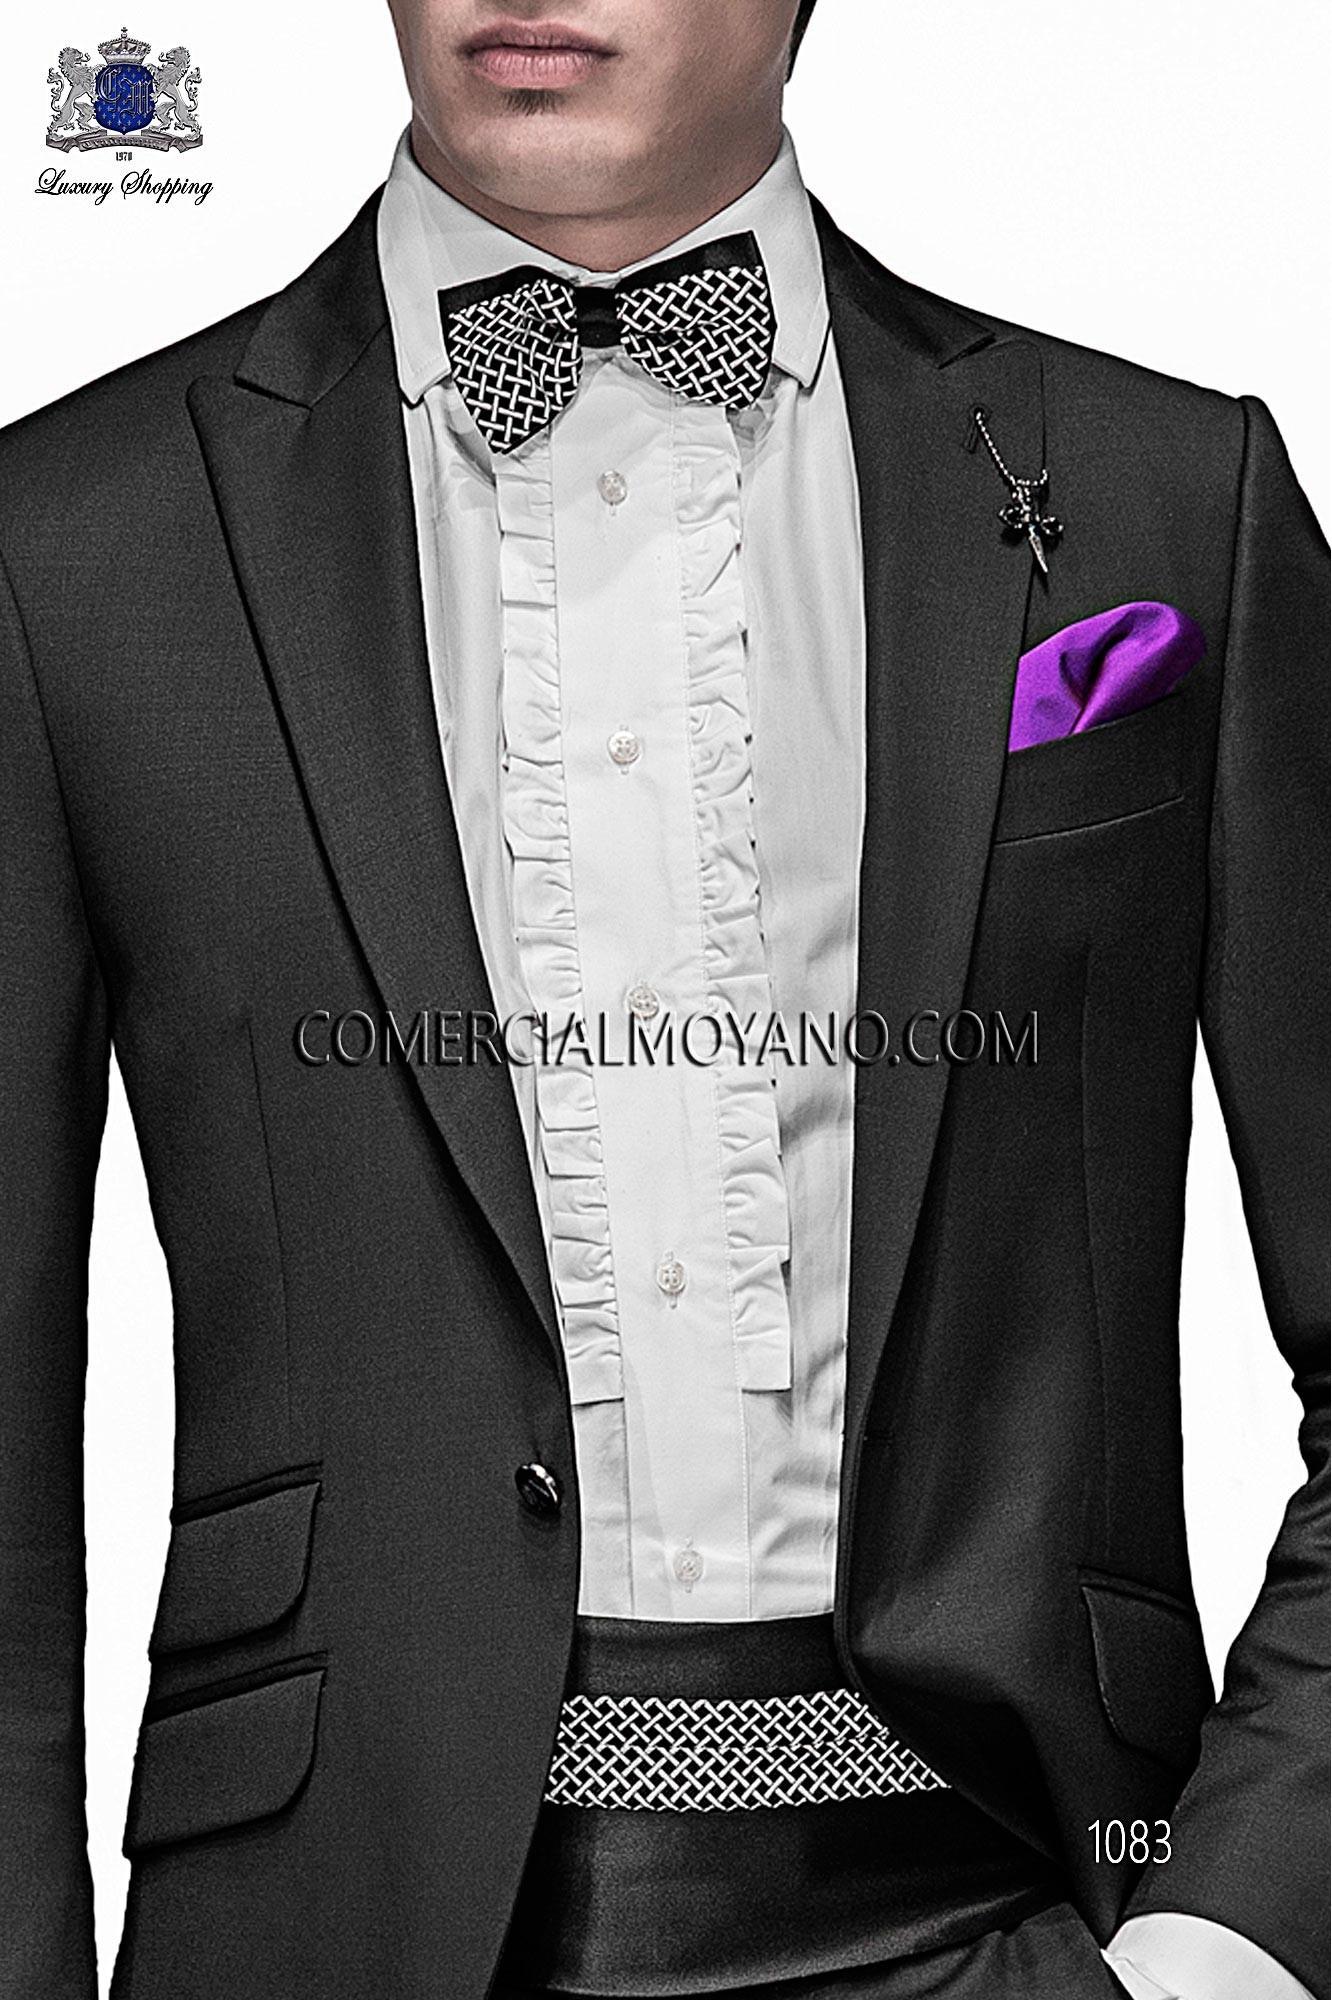 Italian emotion black men wedding suit, model: 1083 Ottavio Nuccio Gala Emotion Collection